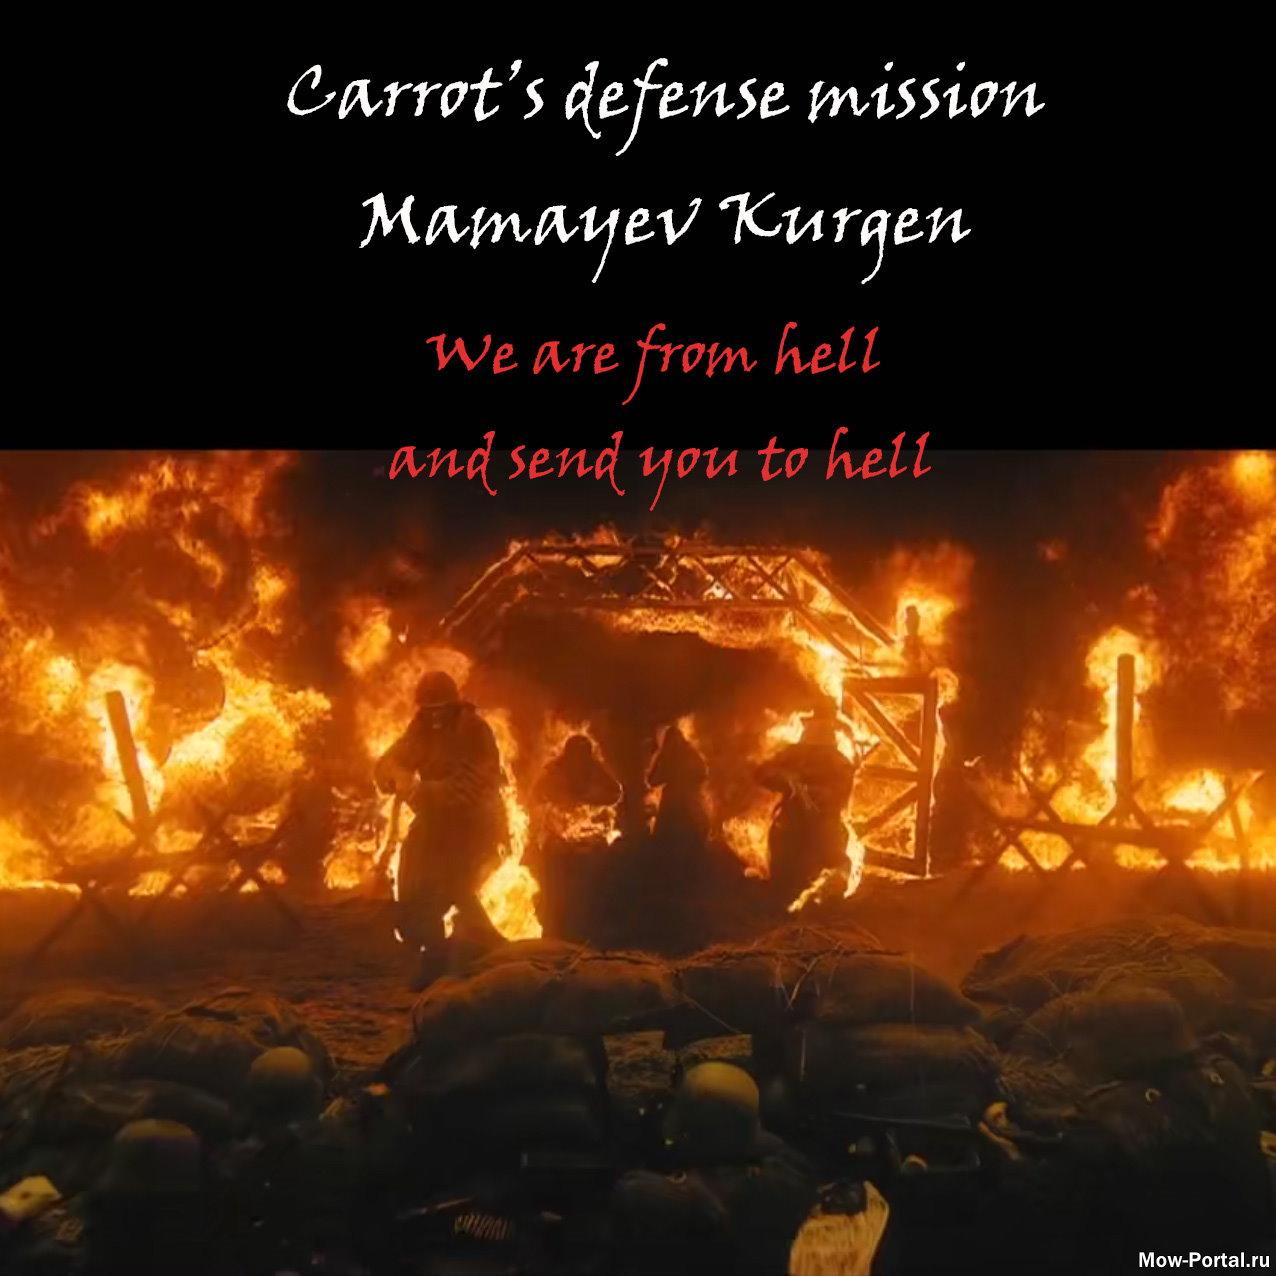 Скачать файл Carrot's RobZ defense mission Mamayev Kurgen (AS2 — 3.262.0) (v07.08.2020)